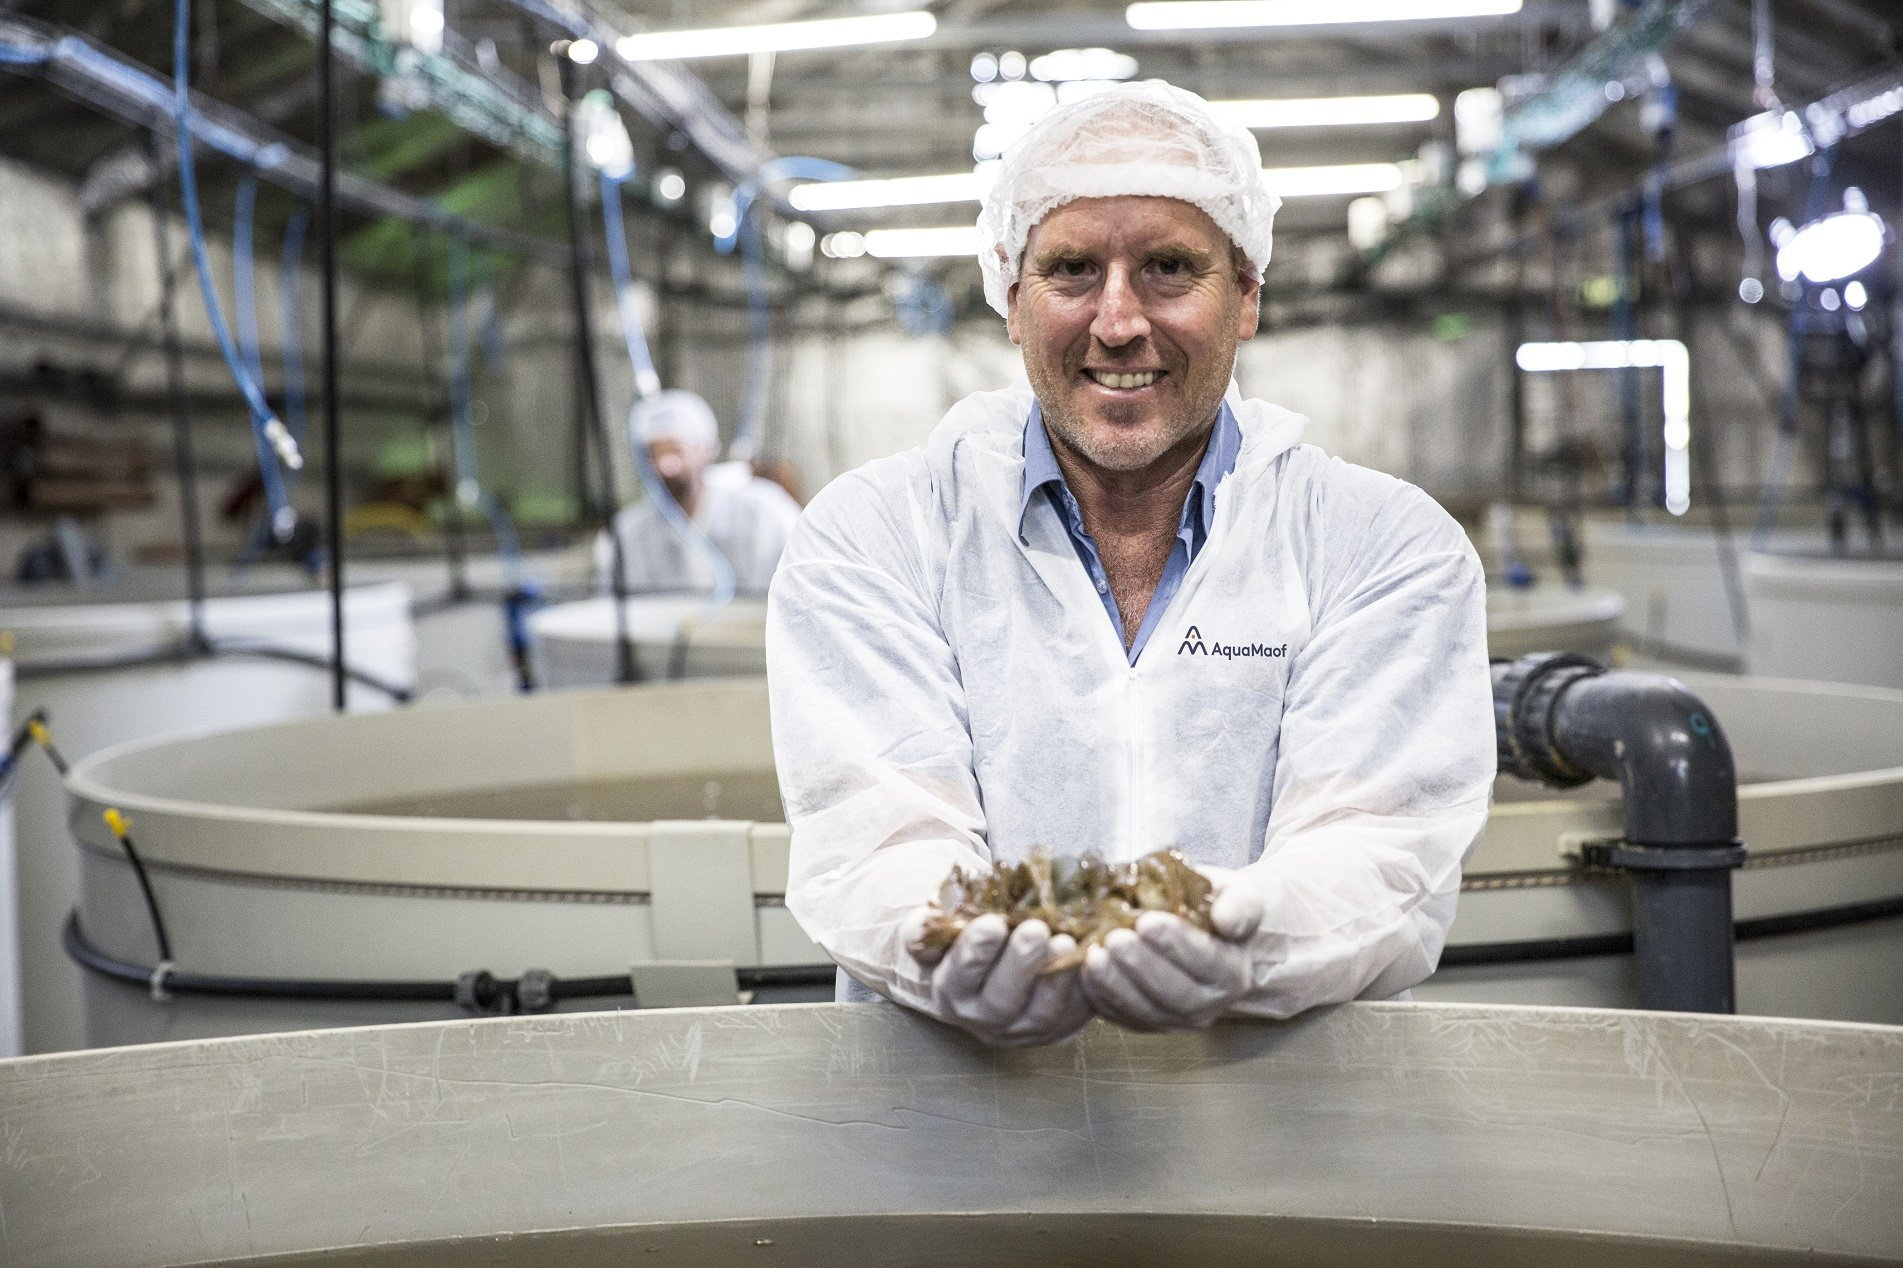 A man holding shrimps